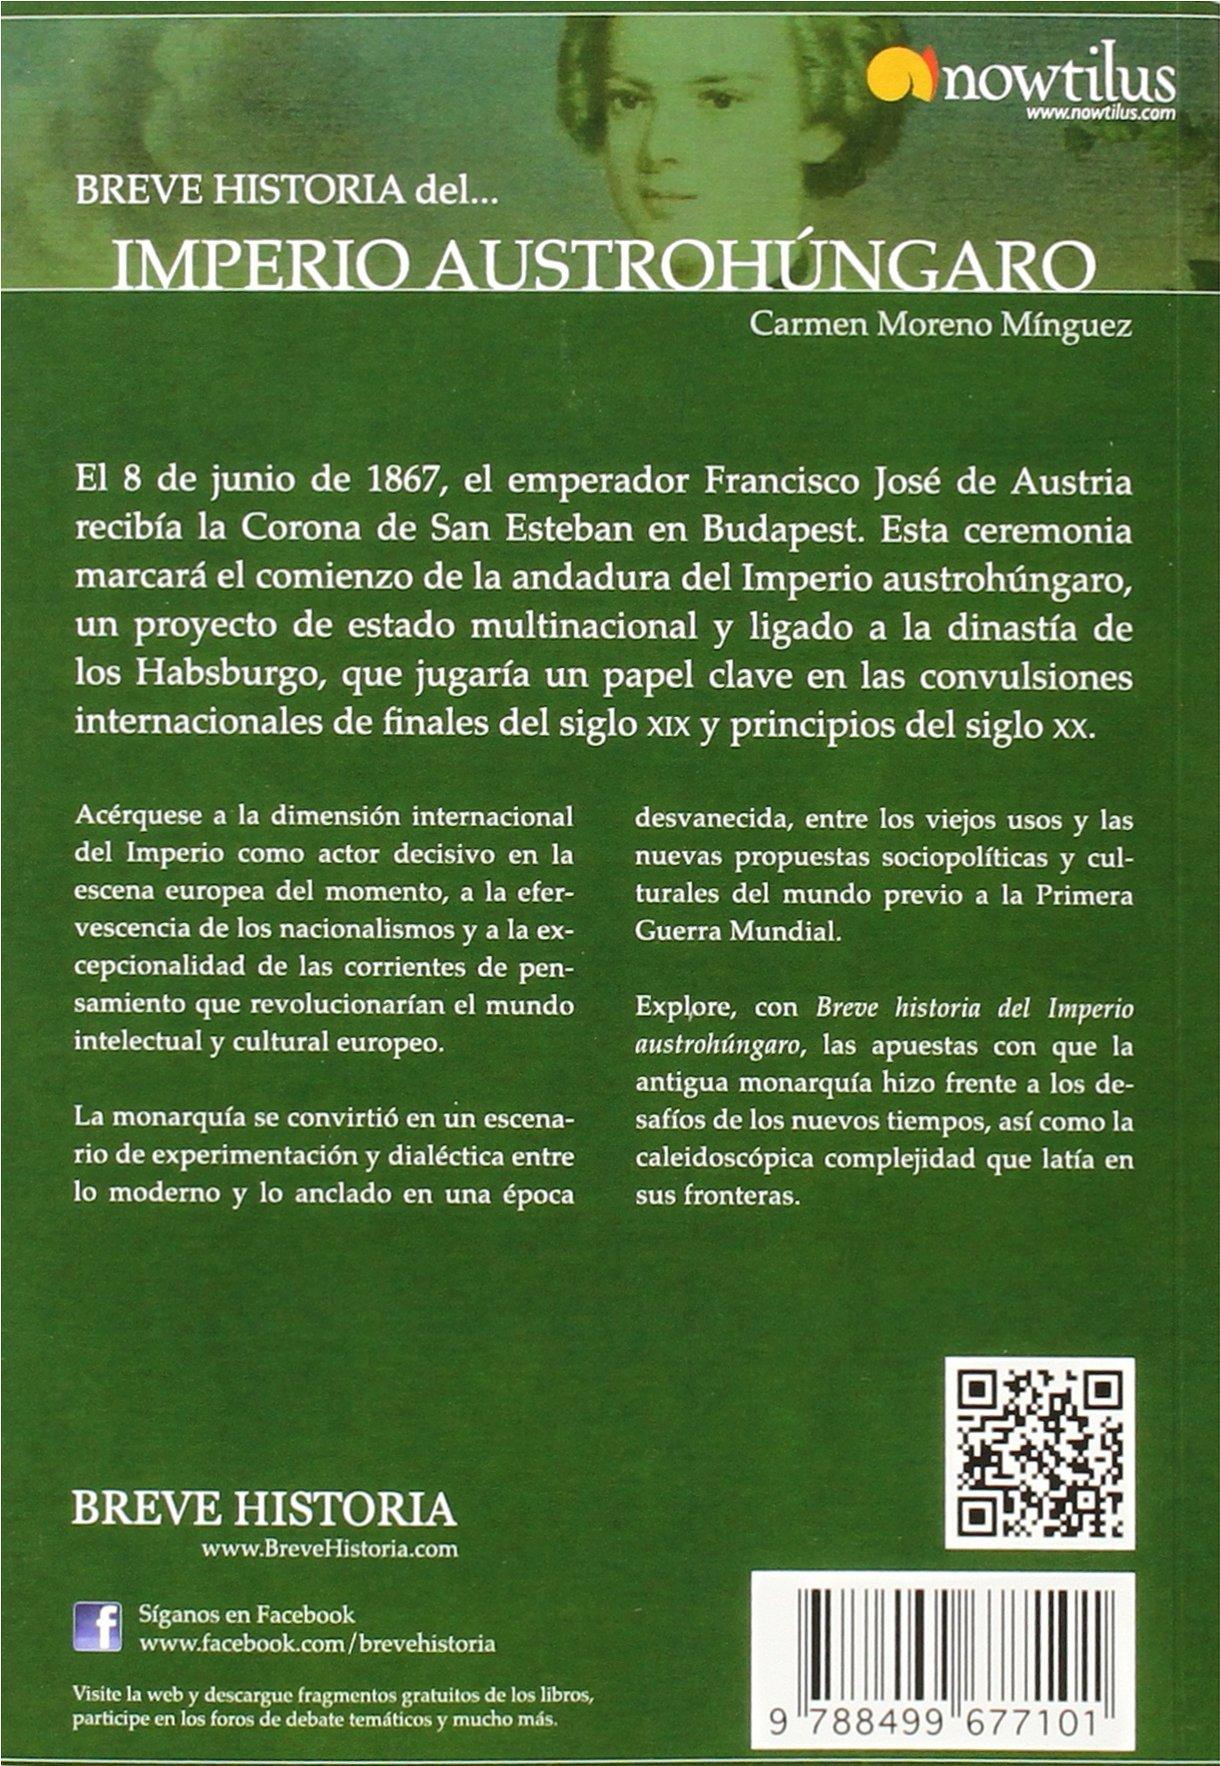 Breve historia del Imperio Austrohúngaro: Amazon.es: Moreno Minguez, Carmen: Libros